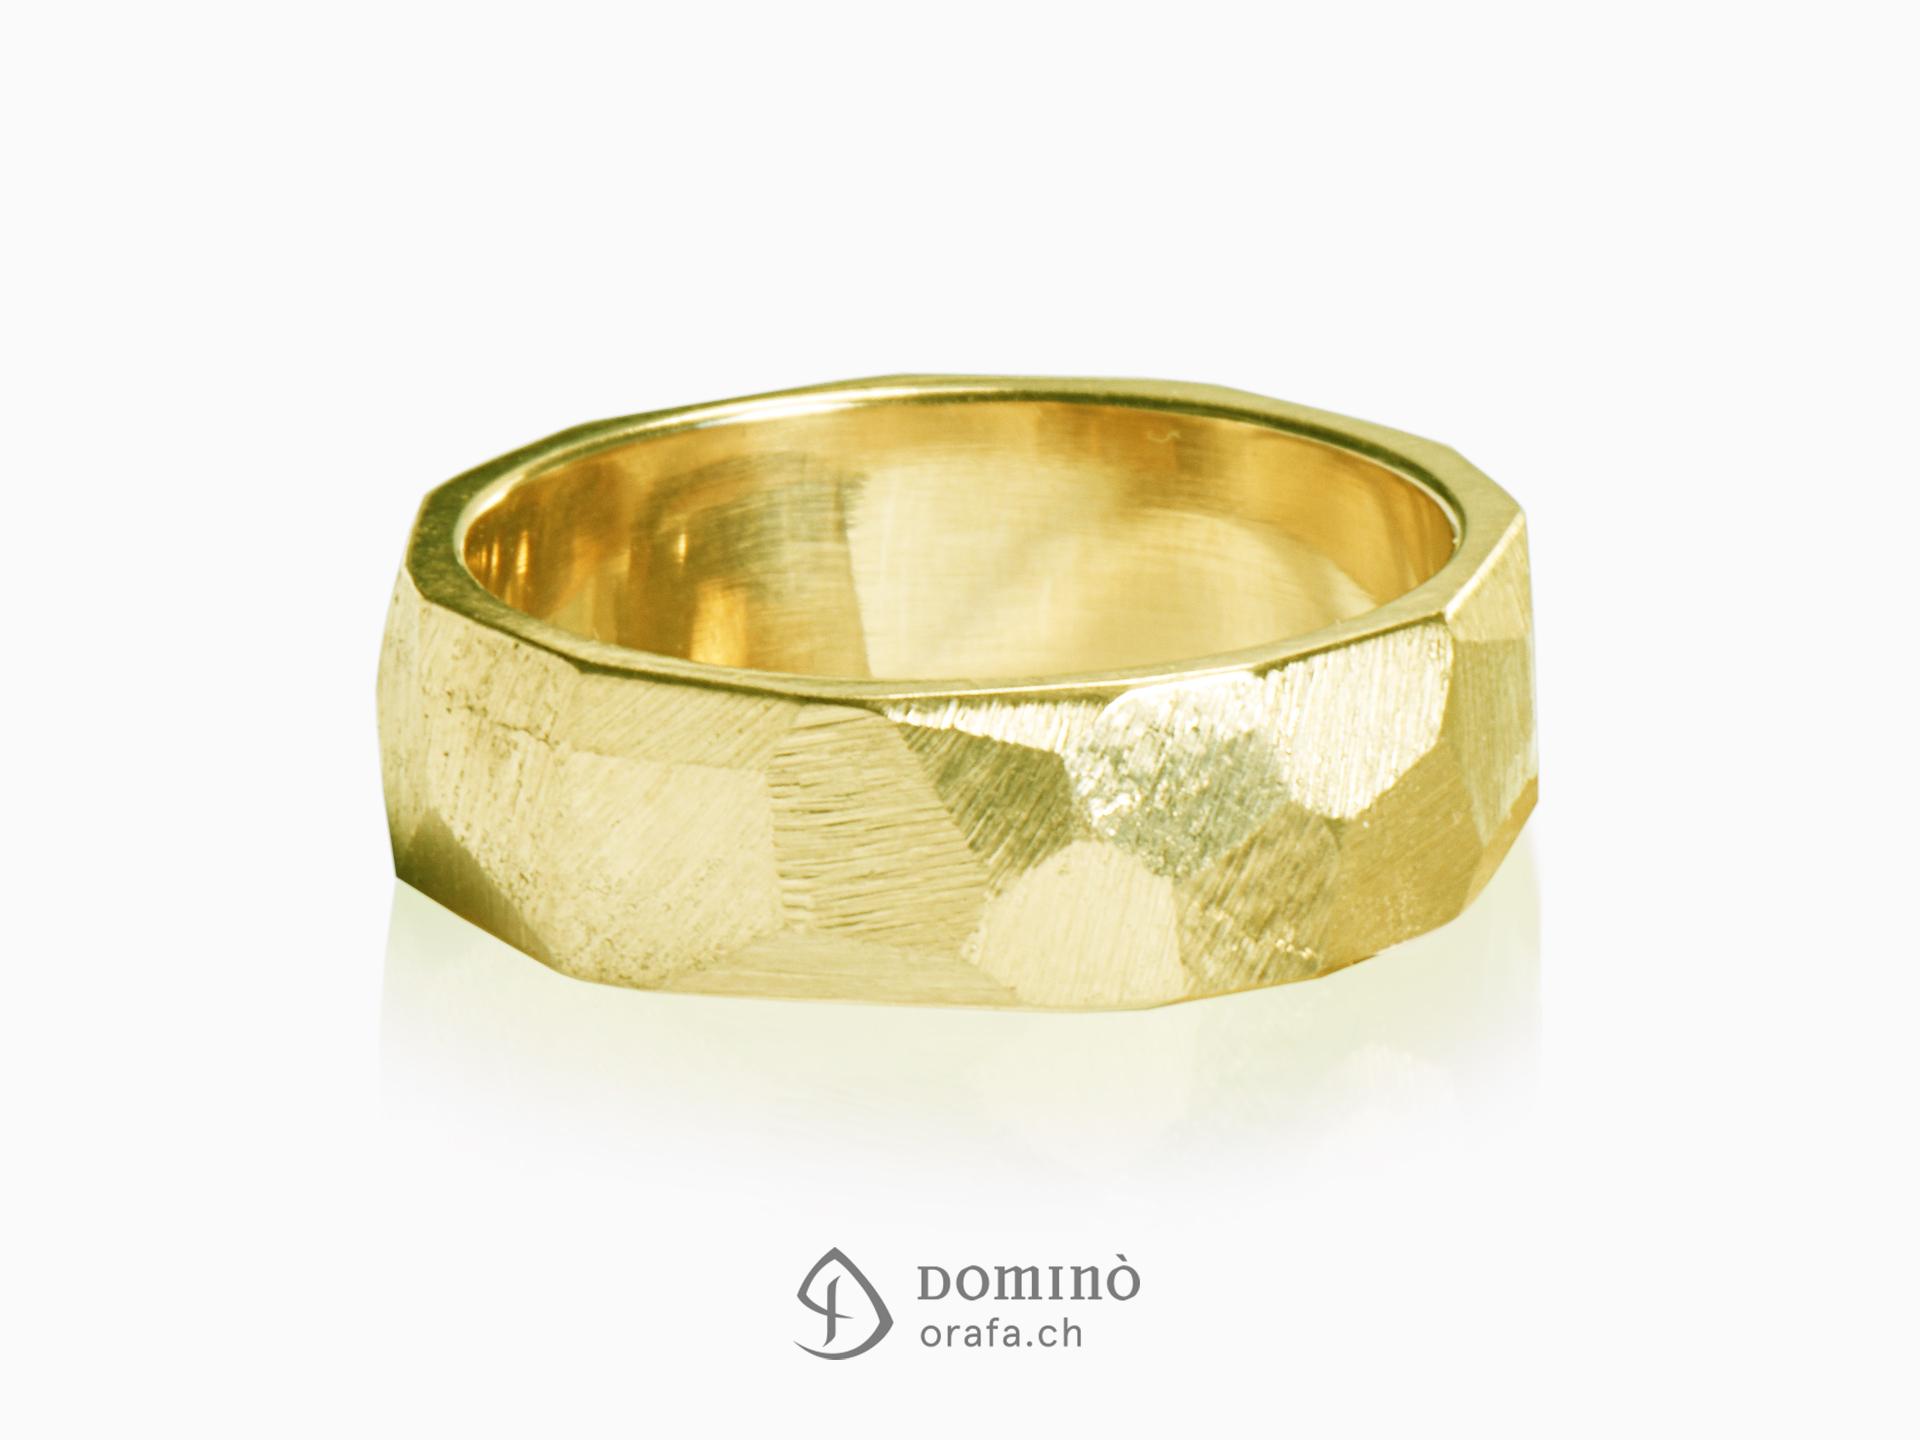 Sfaccettati rings